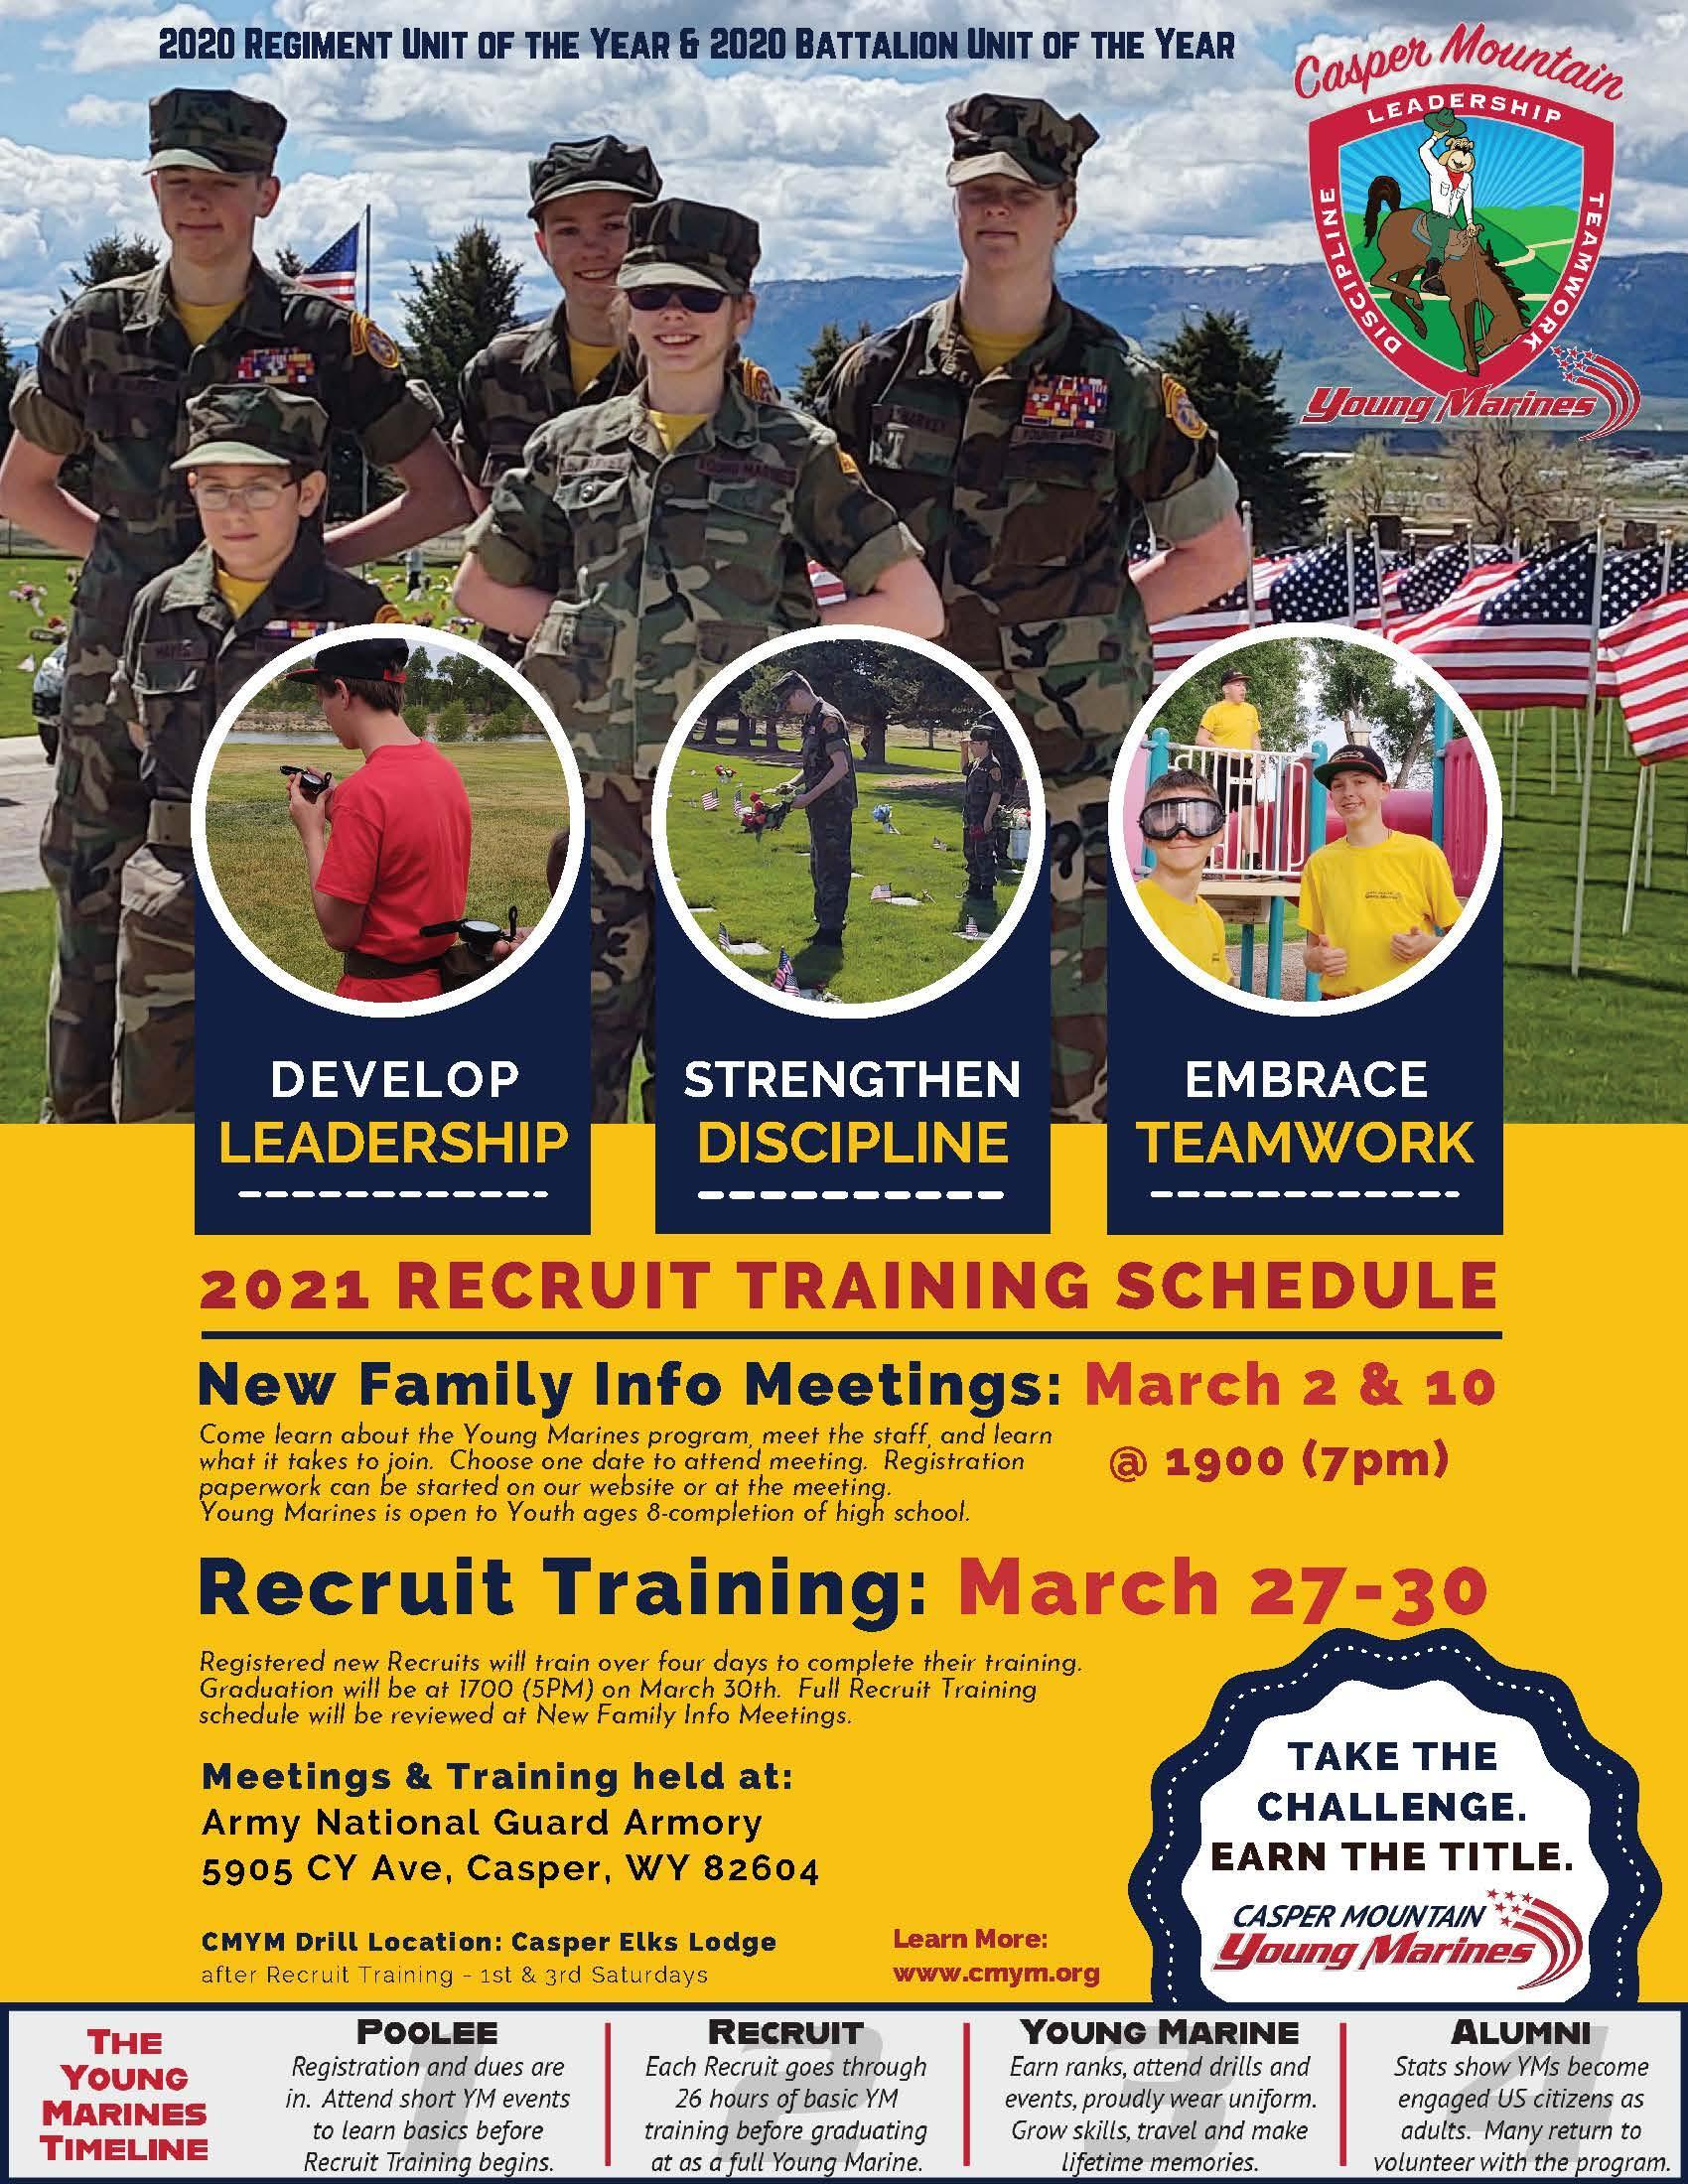 Casper Mountain Young Marines recruitment flyer